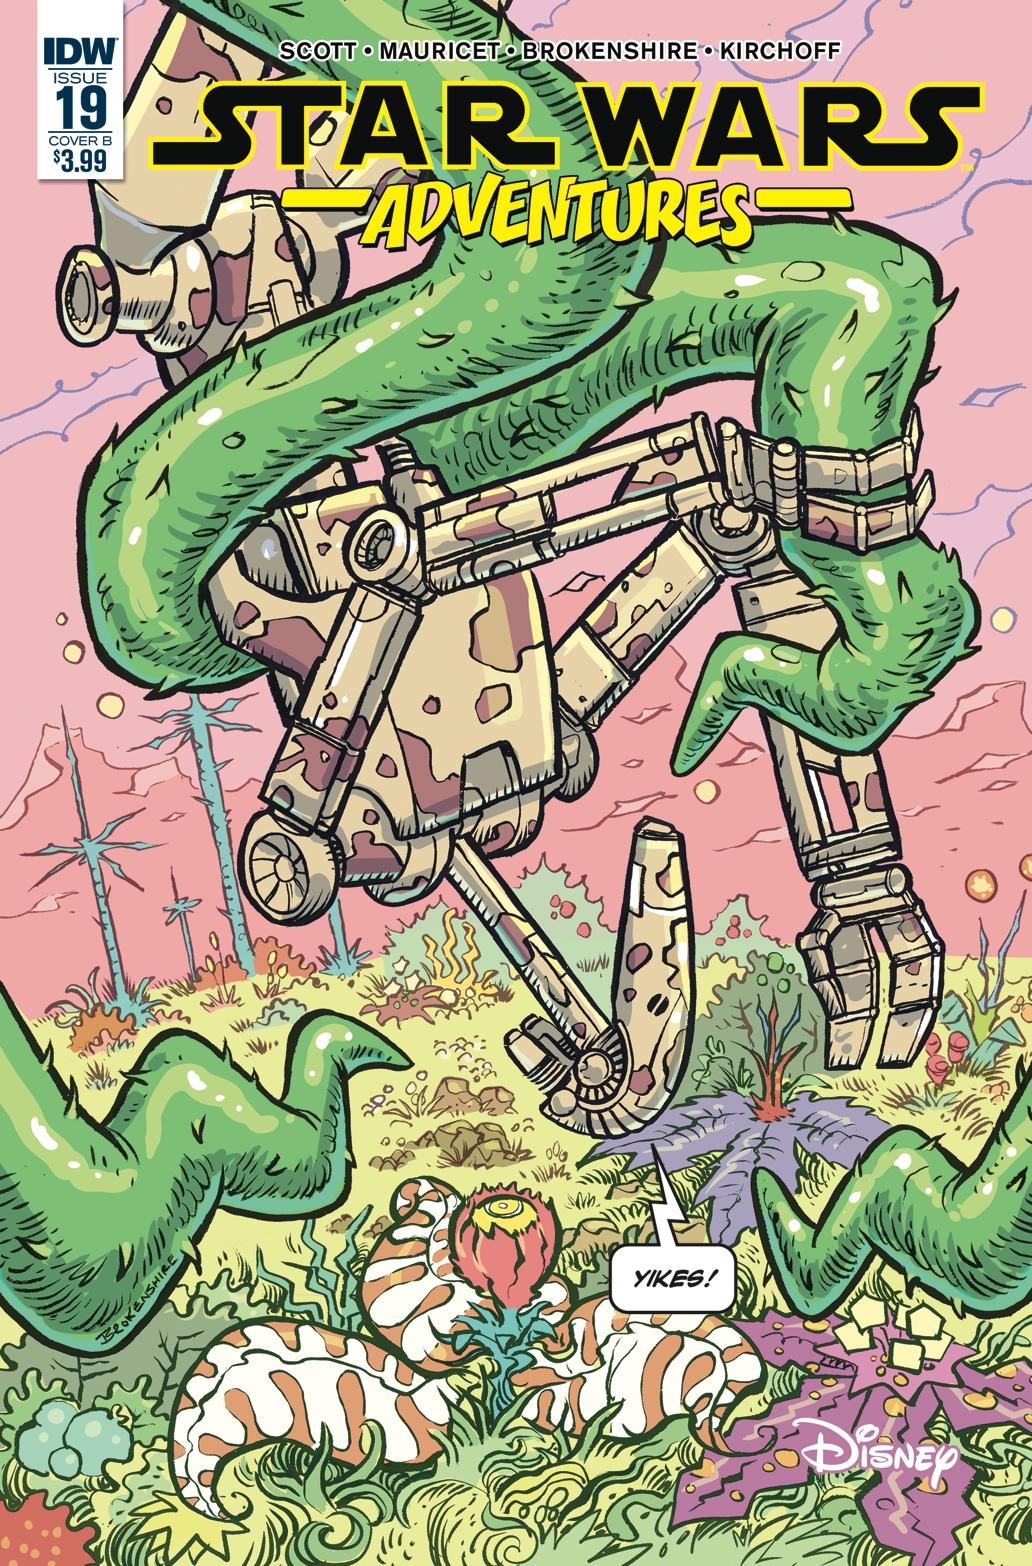 Star Wars Adventures #19 (Cover B by Nickolas Brokenshire) (27.03.2019)